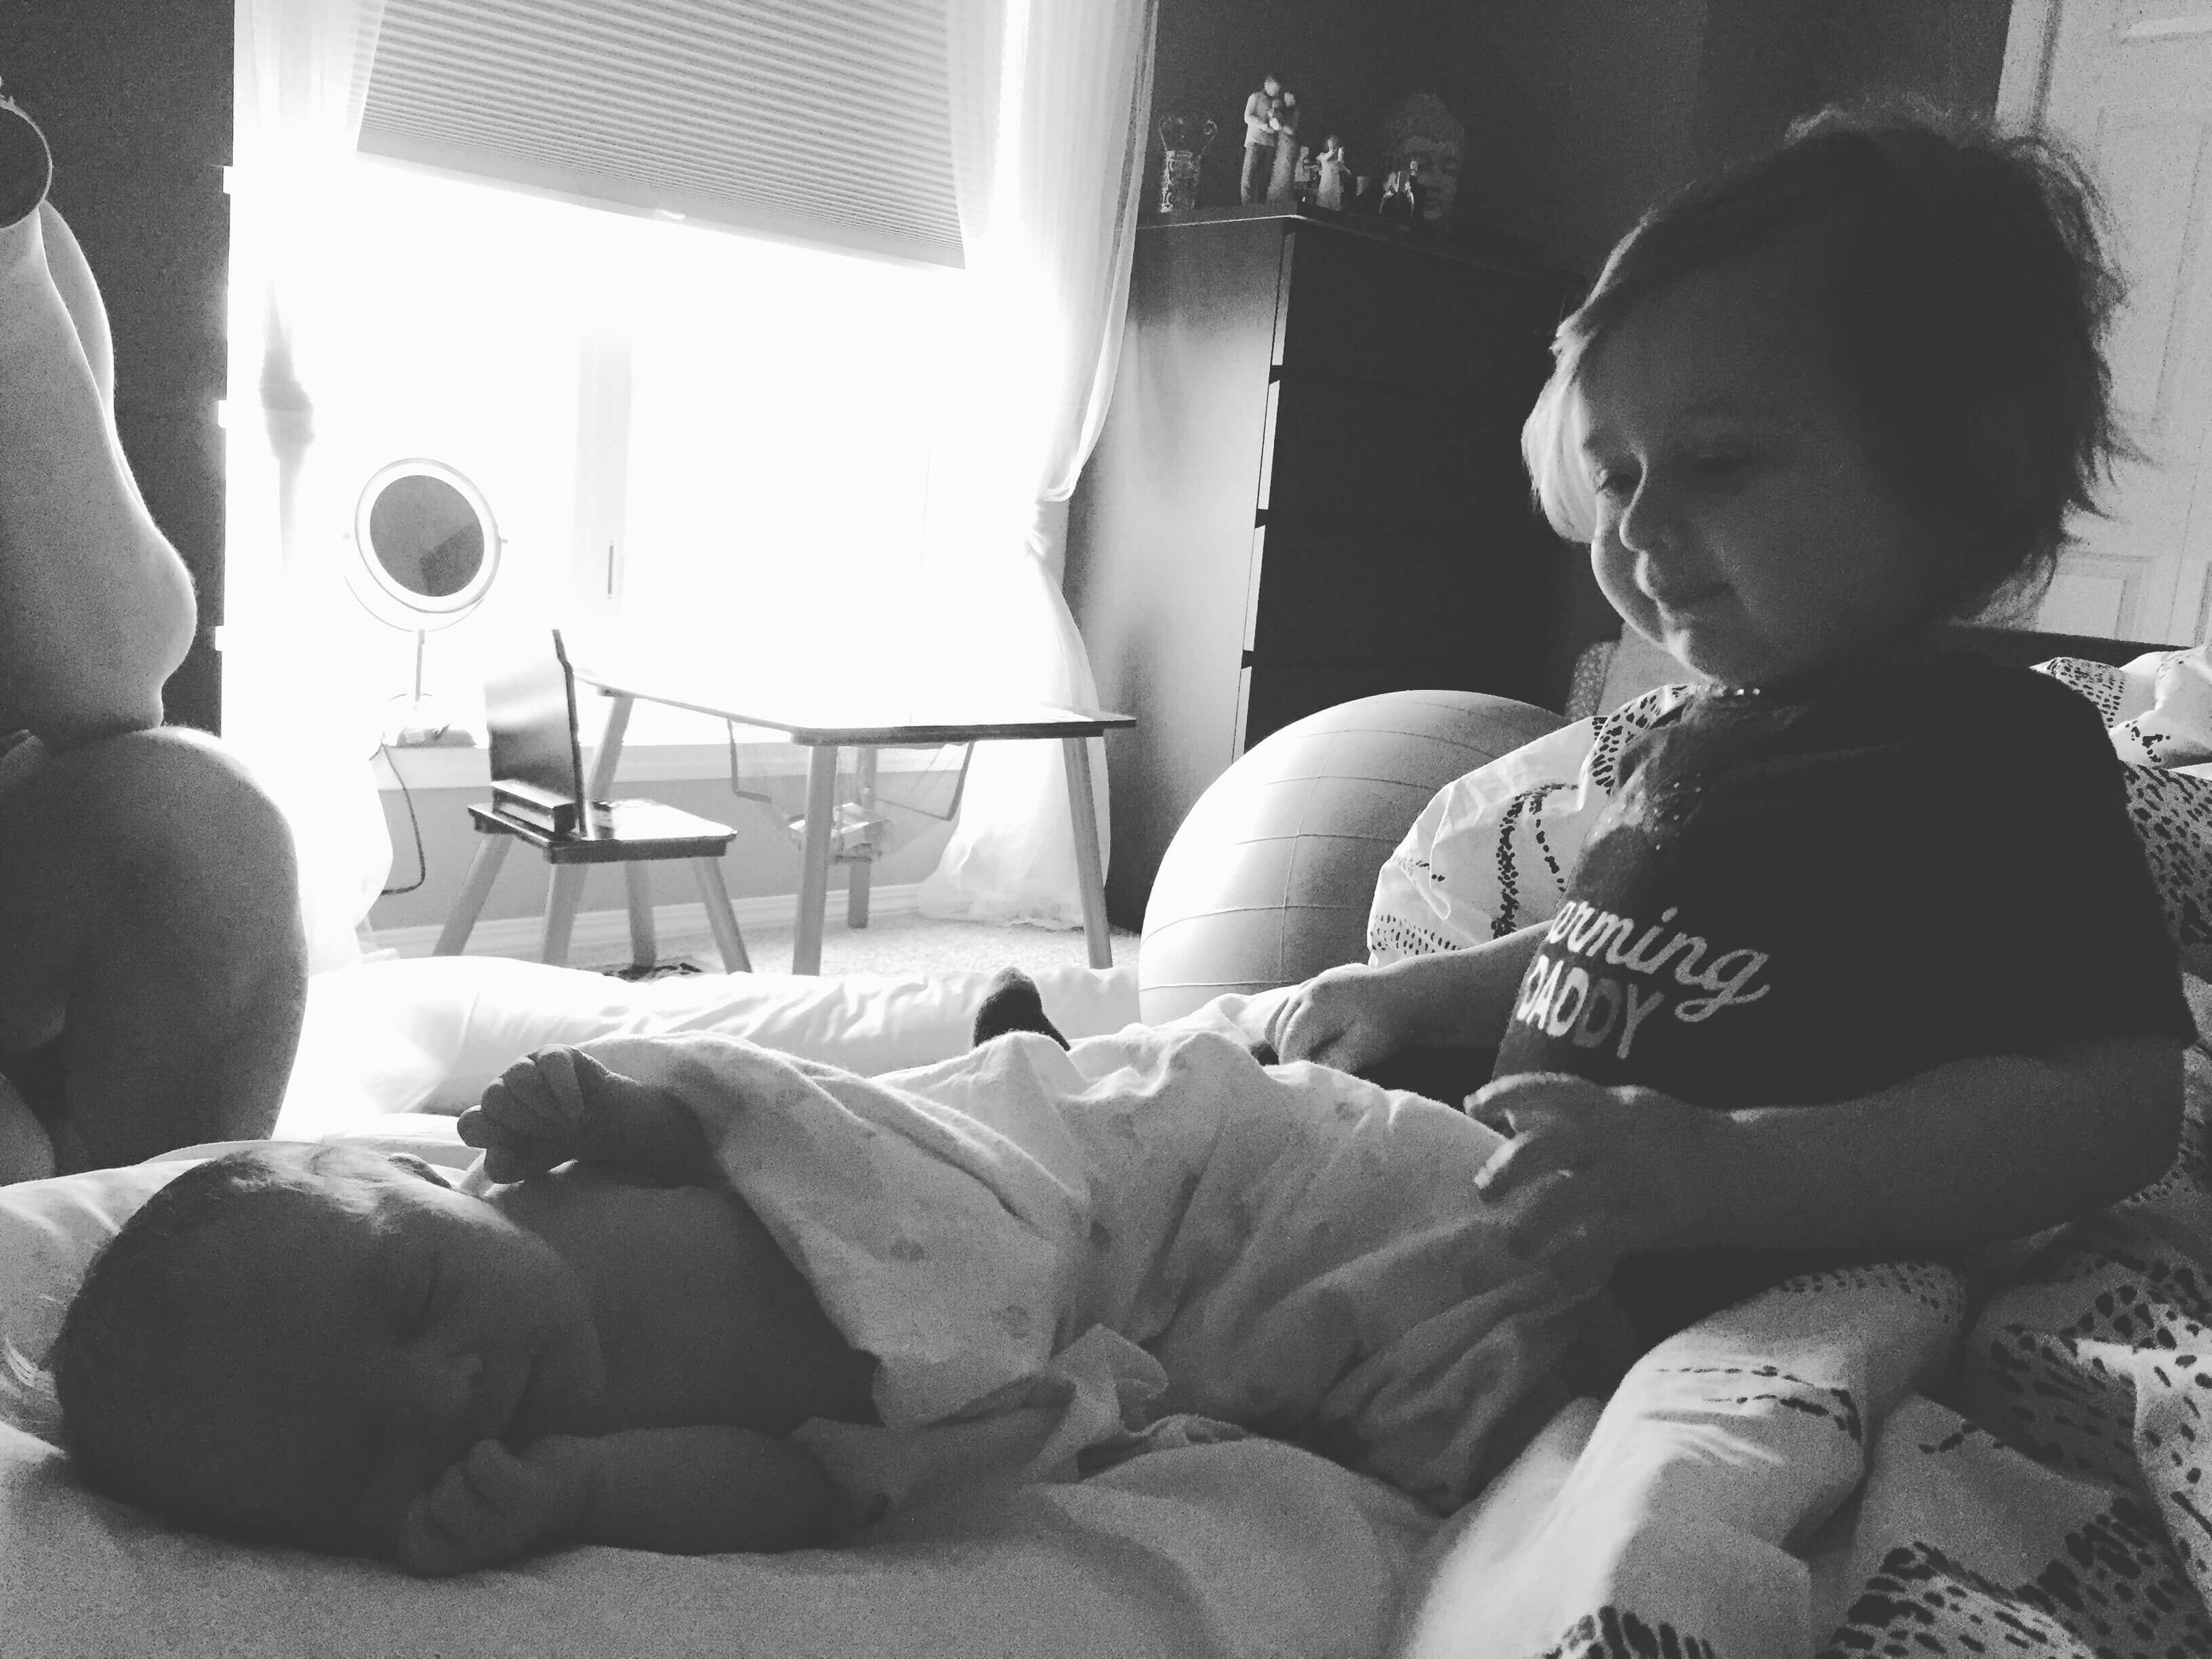 Older sister watching over newborn baby Luna